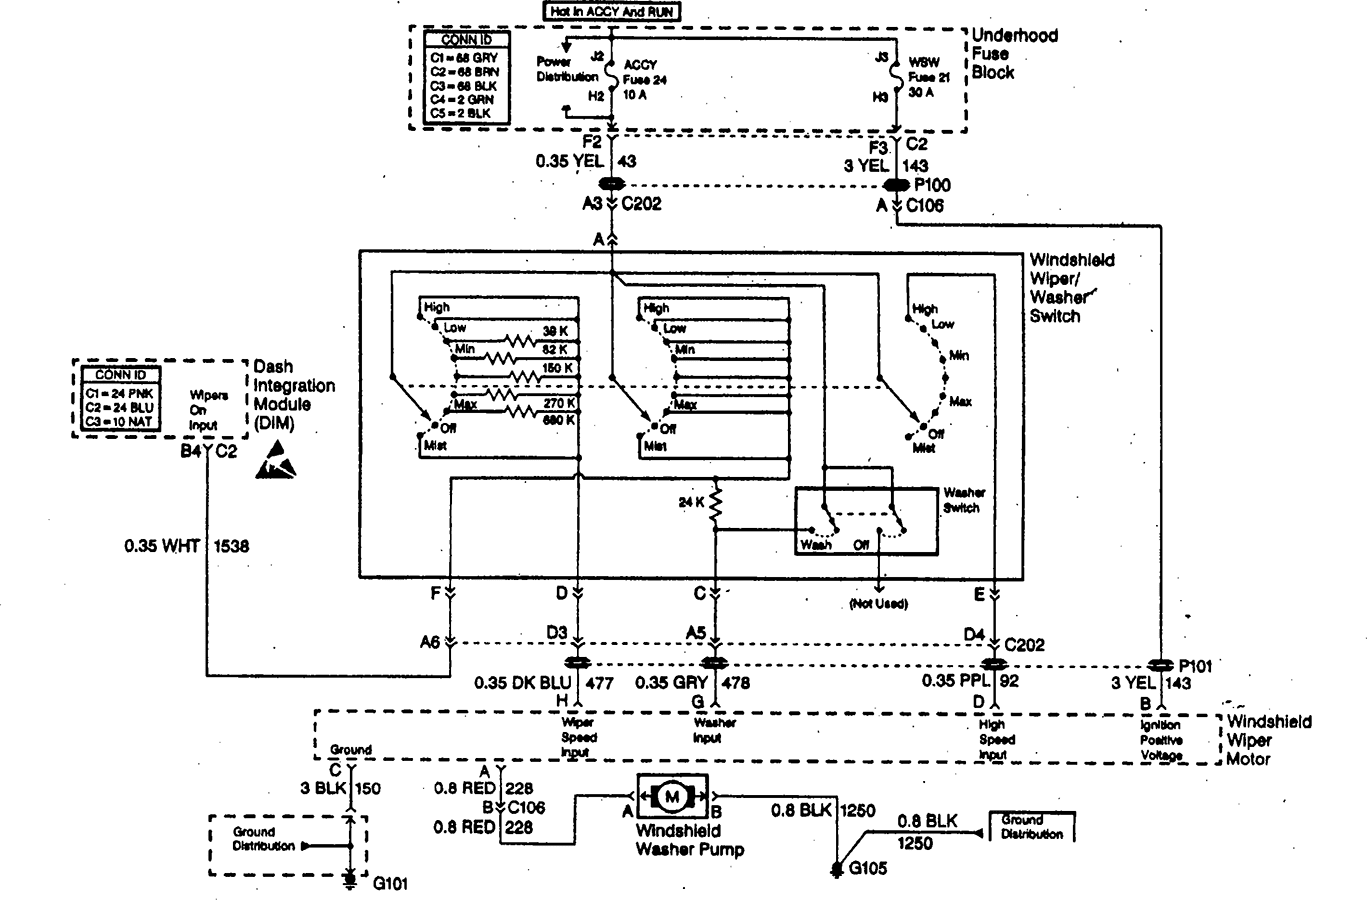 2000 Cadillac Deville Wiper Motor Wiring Diagram 2003 Expedition Fuse Box Diagram Wiringdol Jeanjaures37 Fr